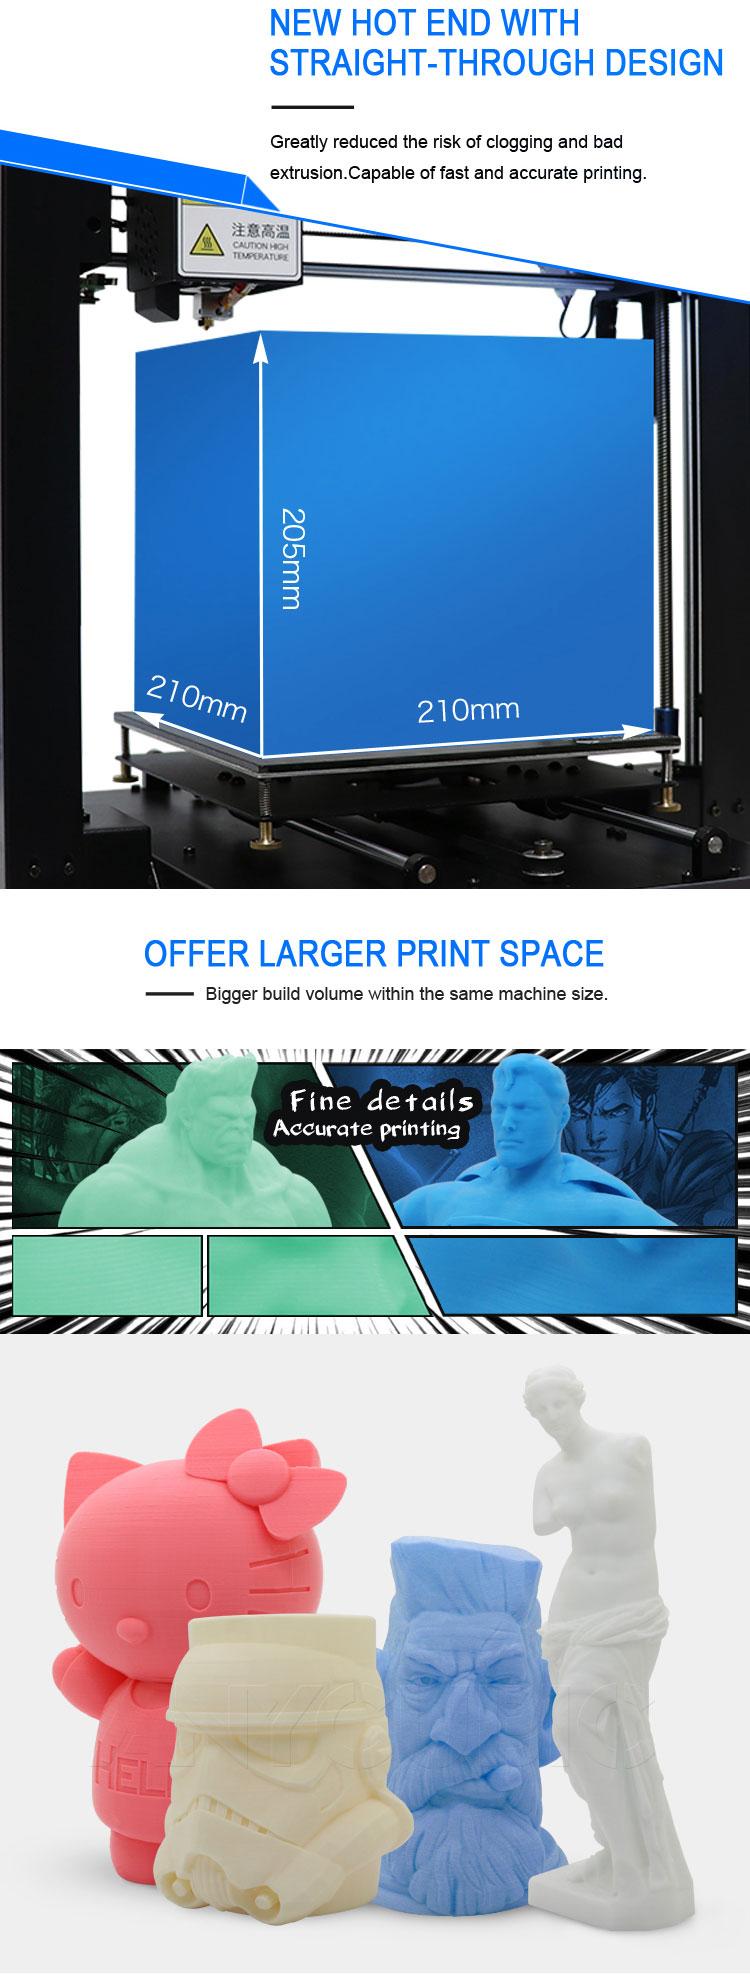 Anycubic 3D printer impresora 3d I3 Mega full metal imprimante 3d High Precision Patented Lattice Platform 3d printer kit (4)